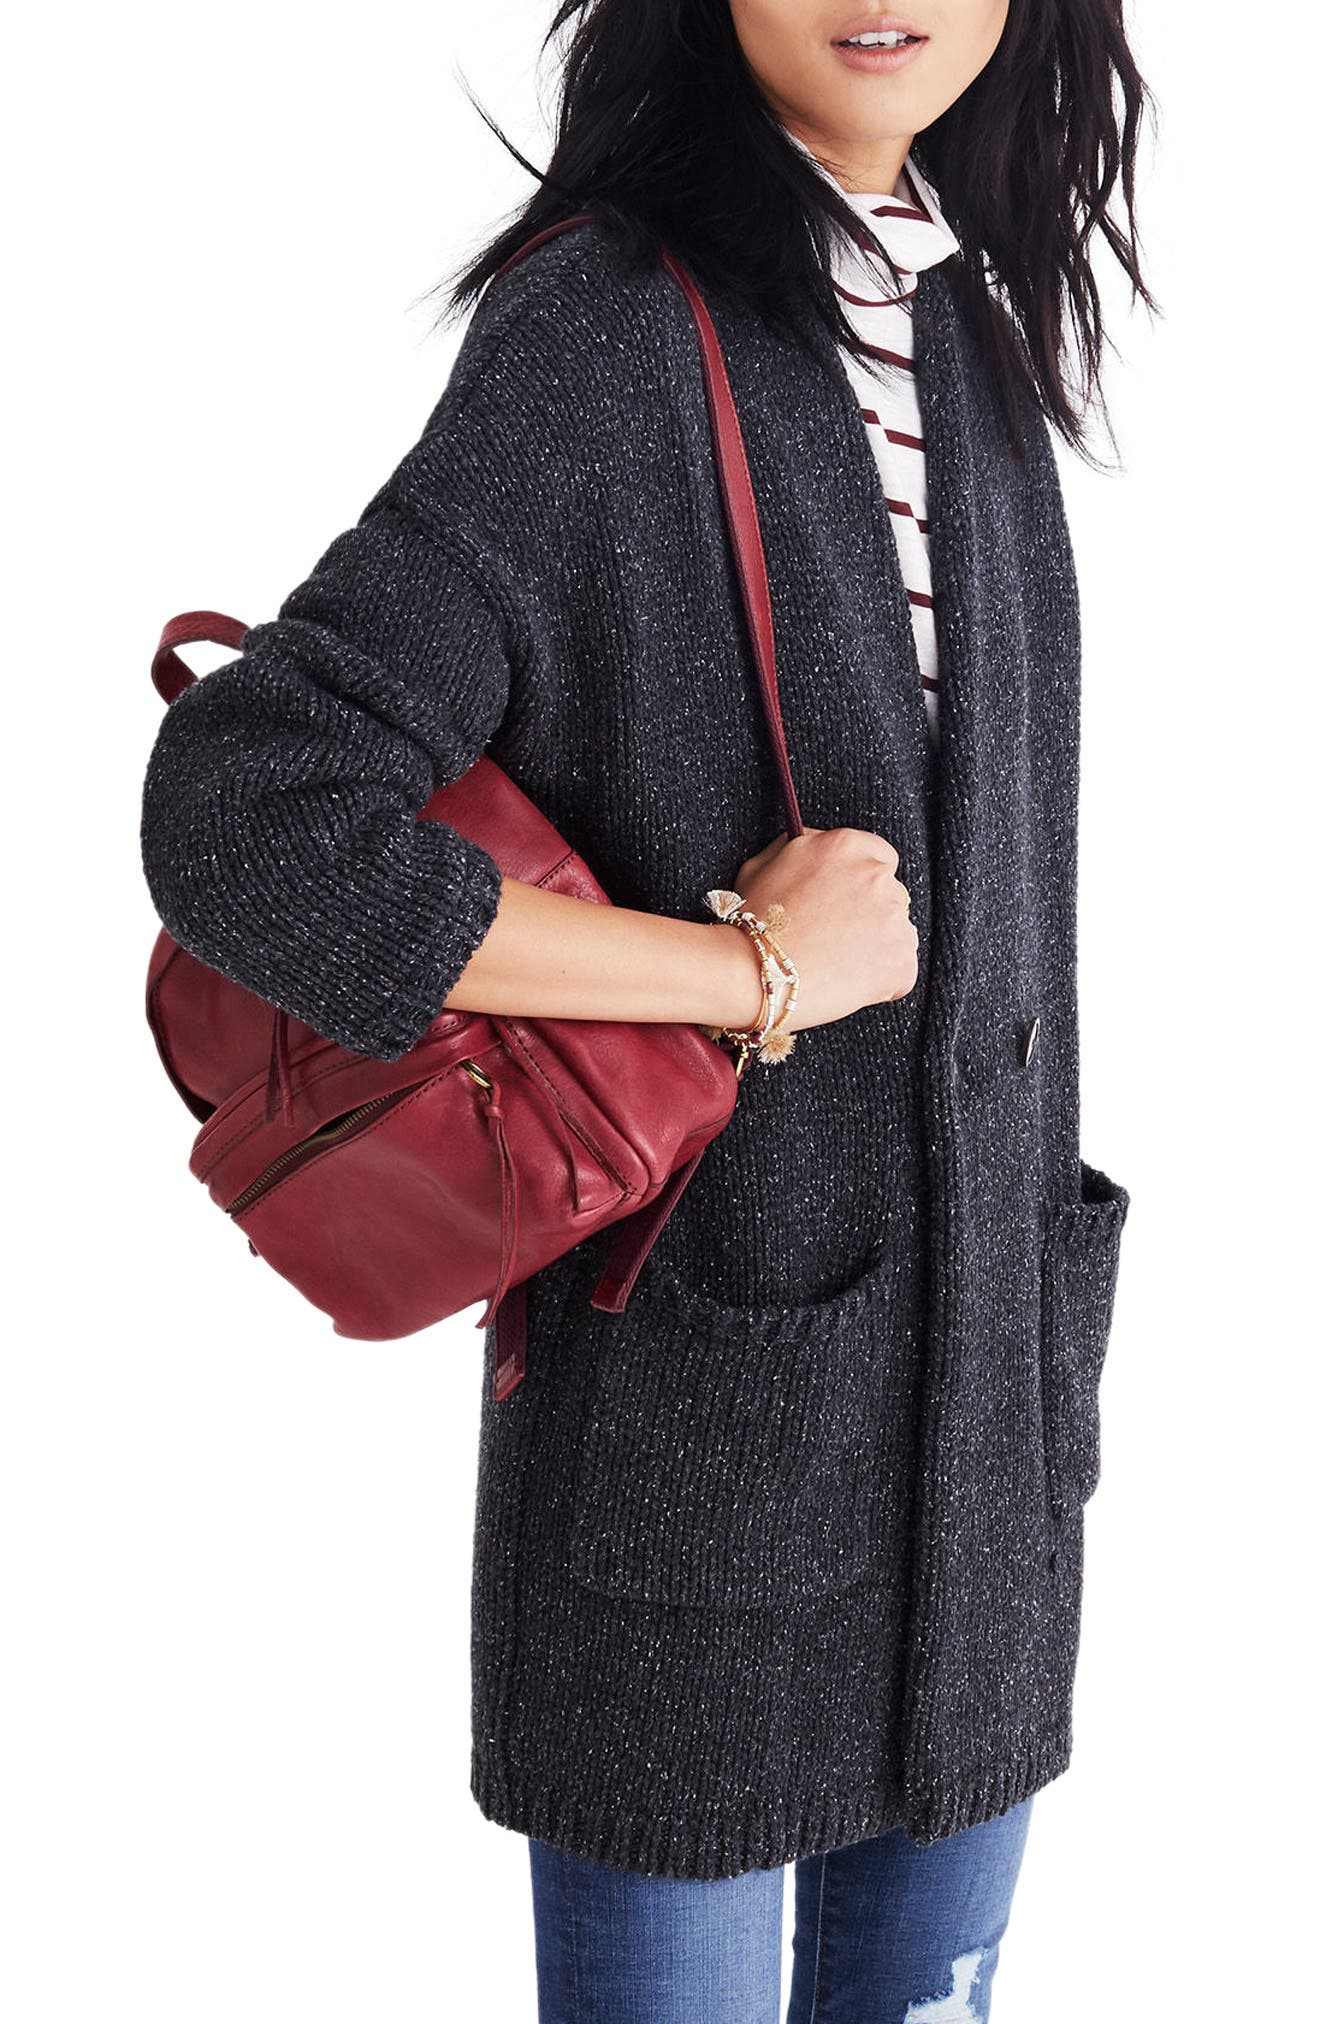 Glenhill Sweater Coat,                         Main,                         color,